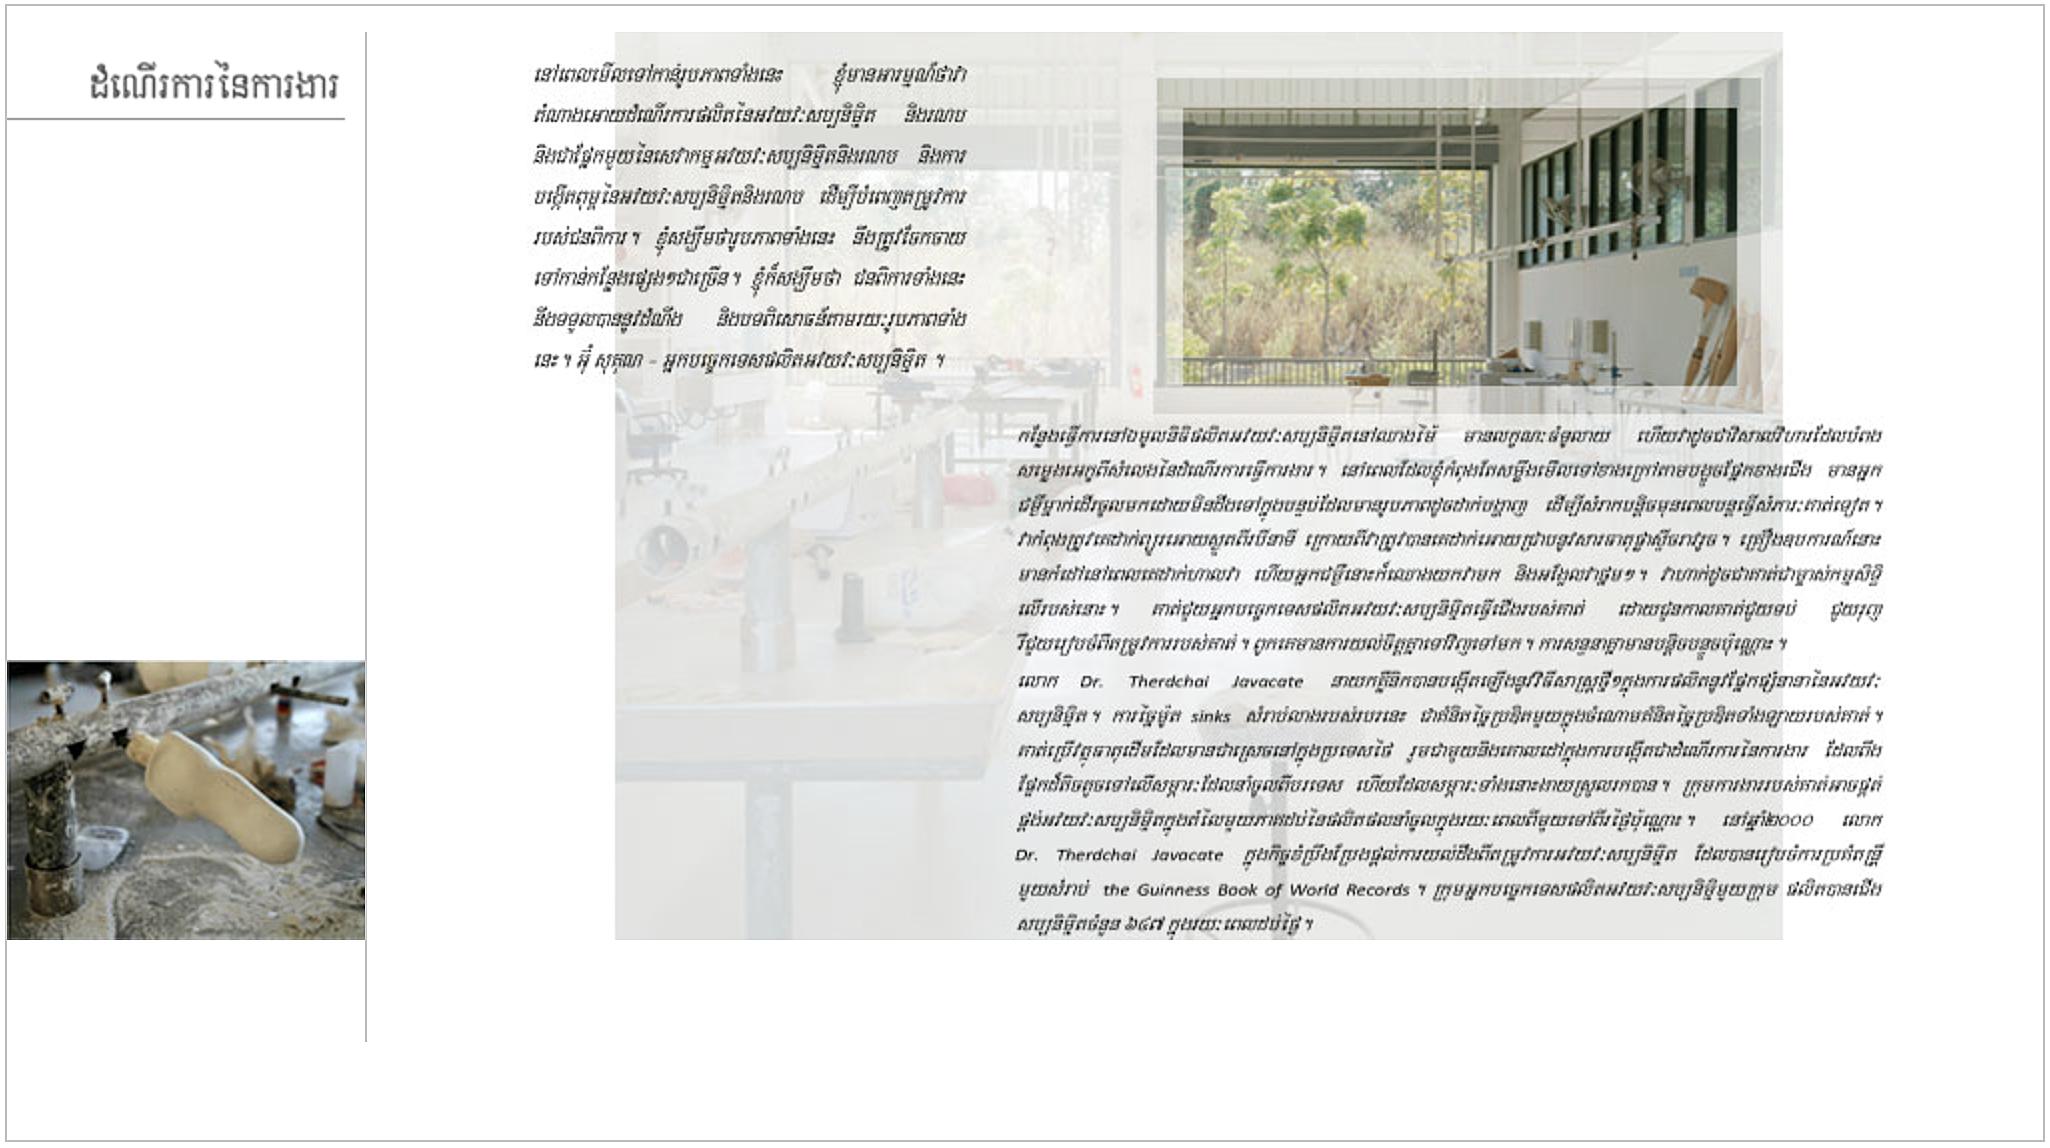 pg 23 copy.jpg